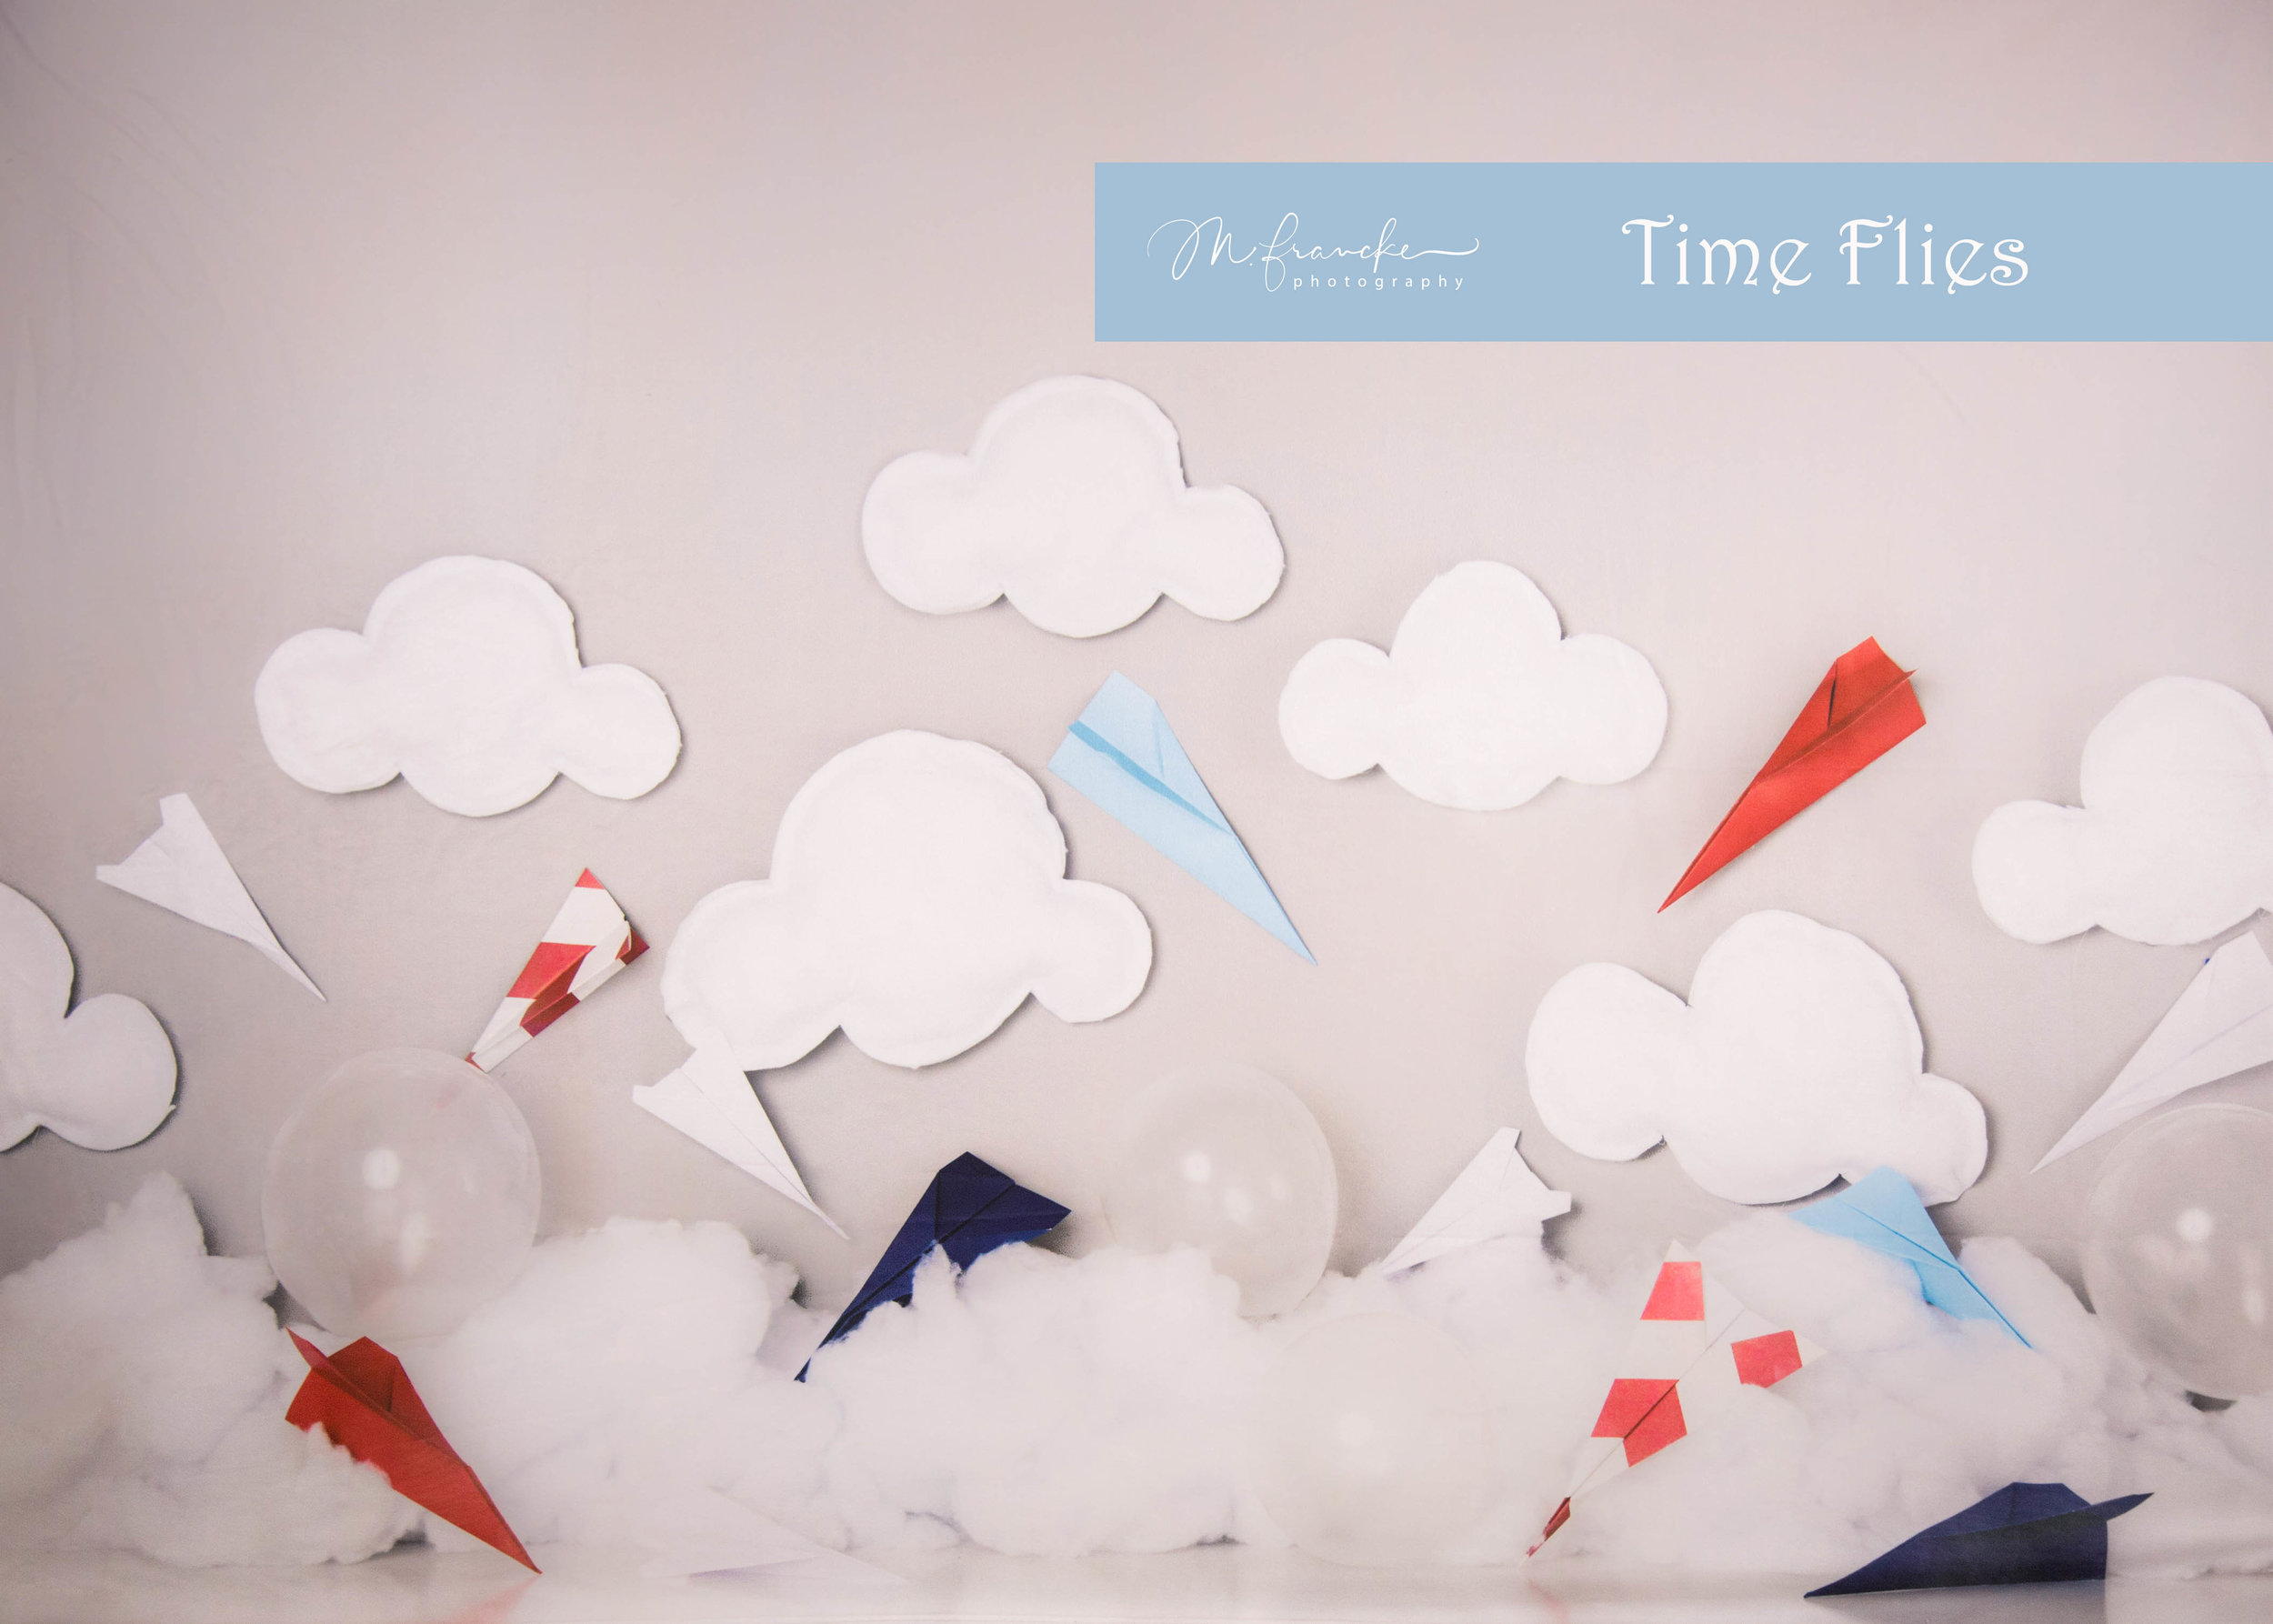 TimeFlies-MFranckePhotography.jpg